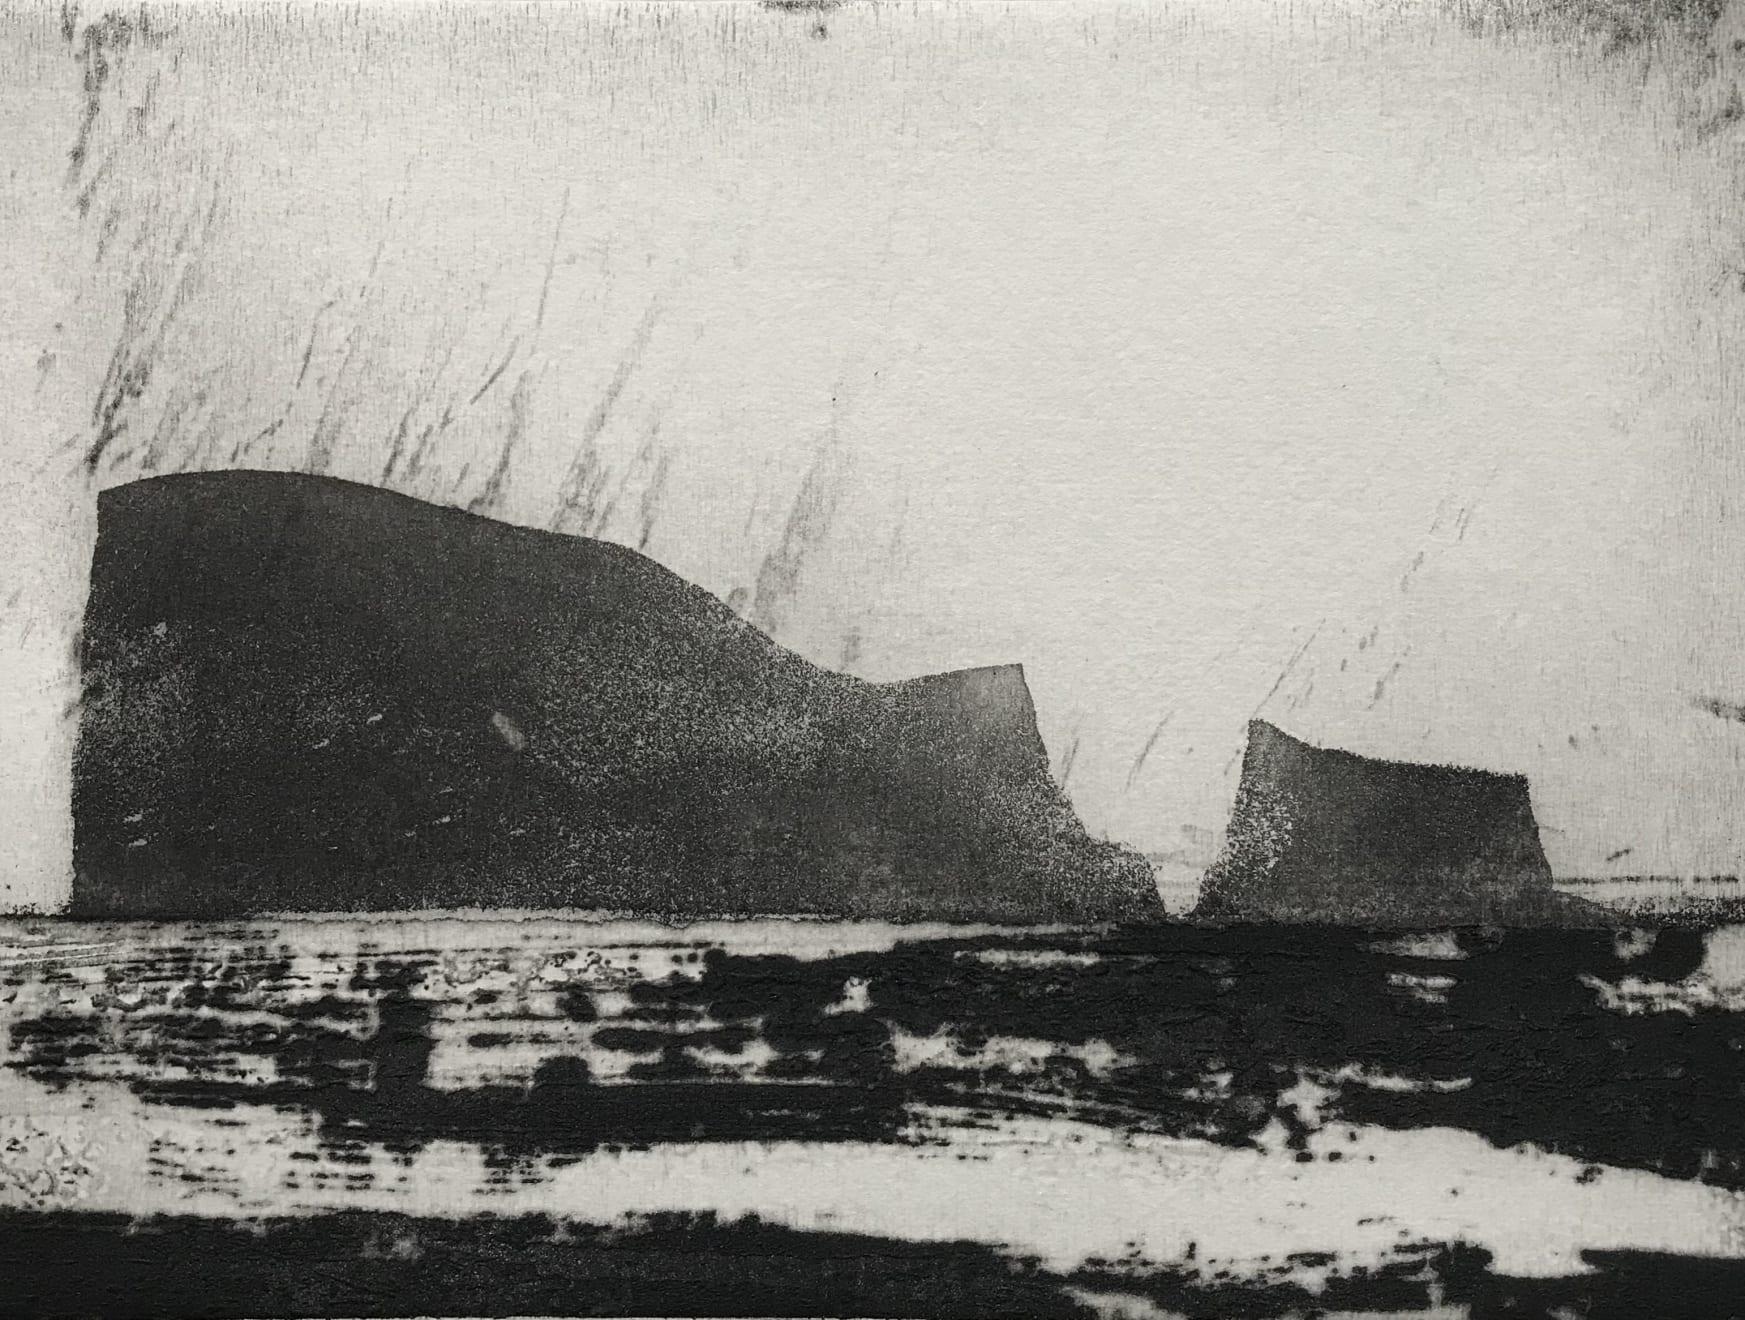 Jason Hicklin, East Tump Grassholm Island, 2020